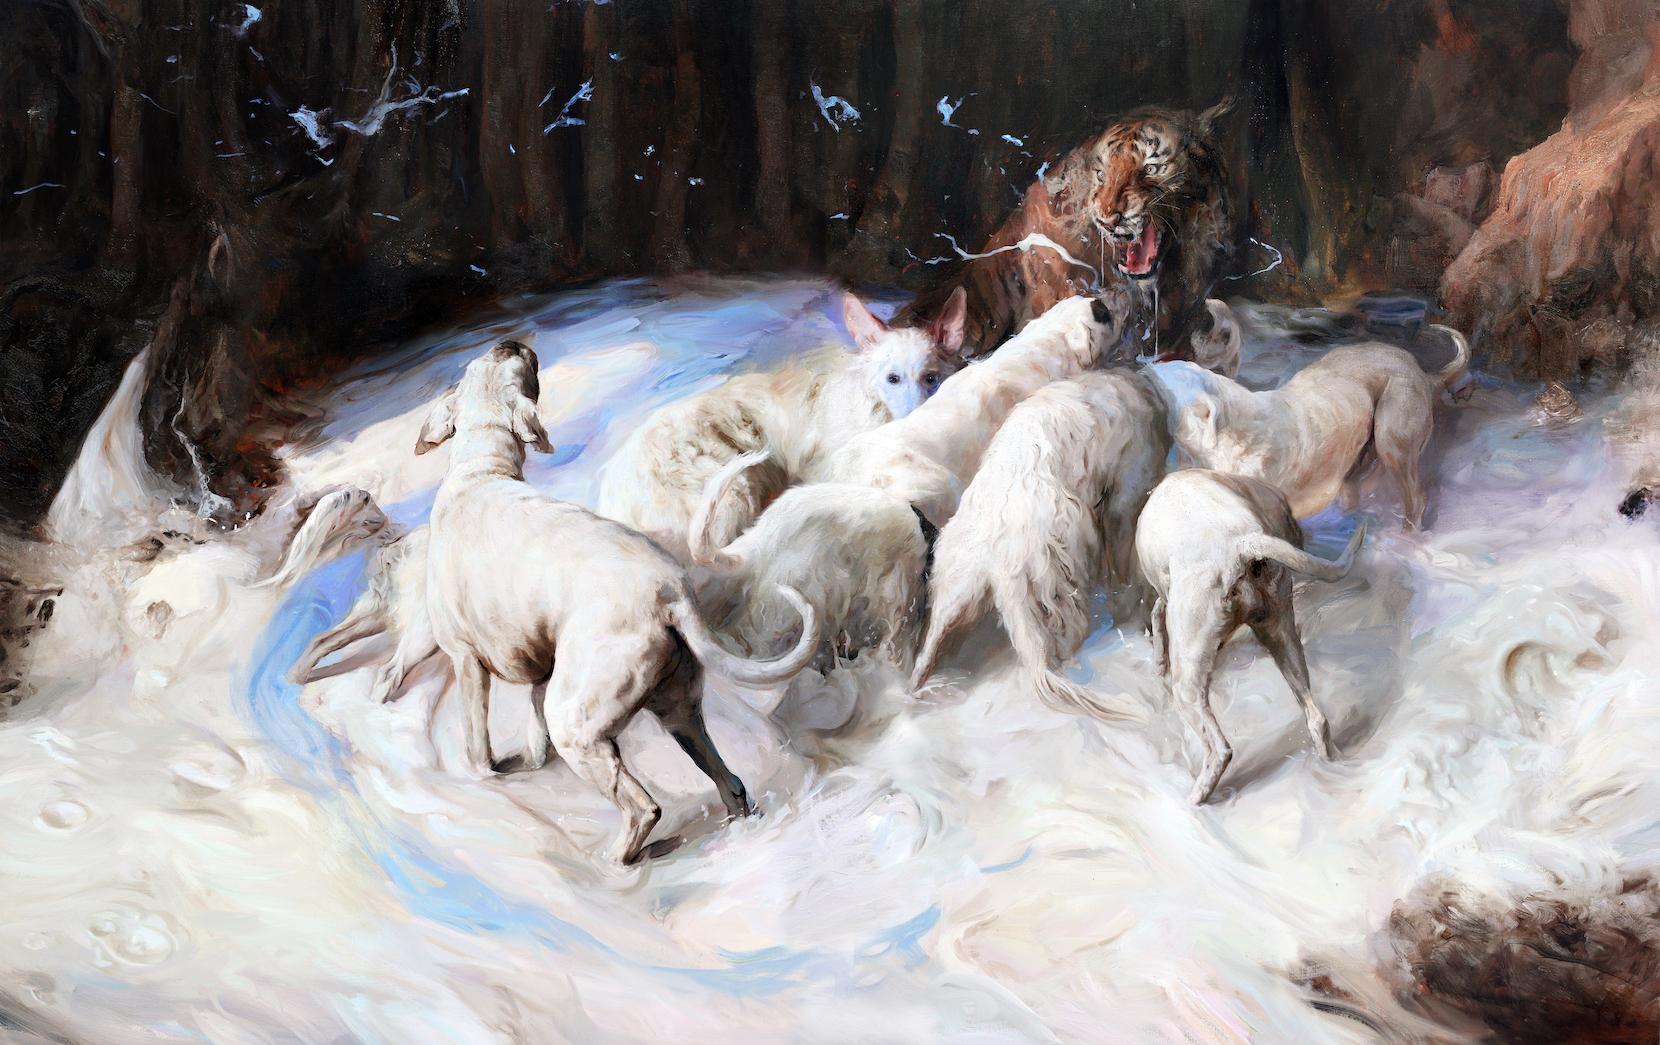 Guillermo Lorca, Make me blue, 2019, oil on canvas, 160x250cm